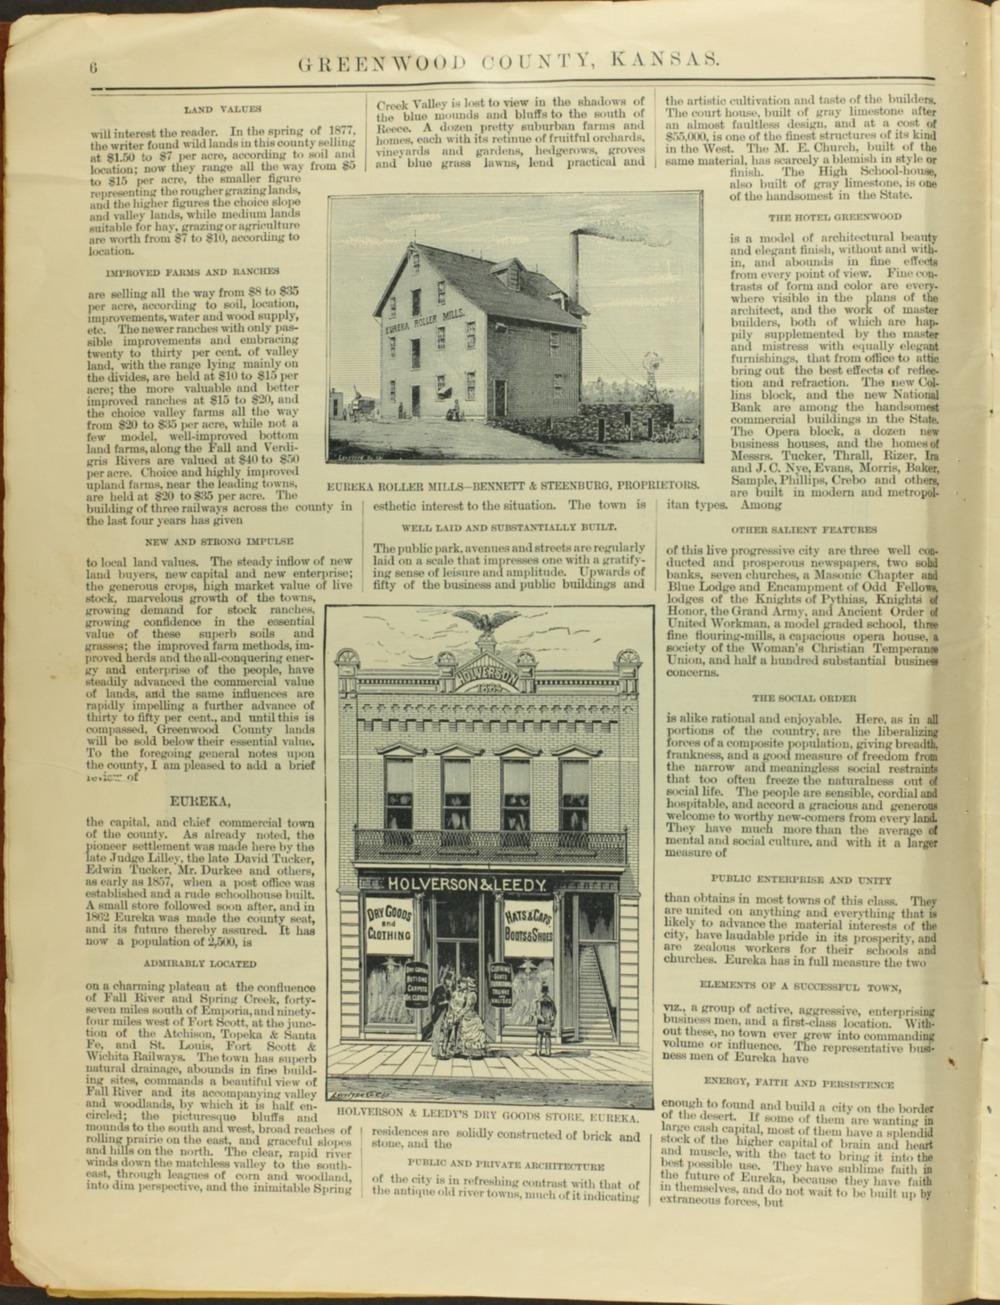 Handbook of Greenwood County, Kansas - 6